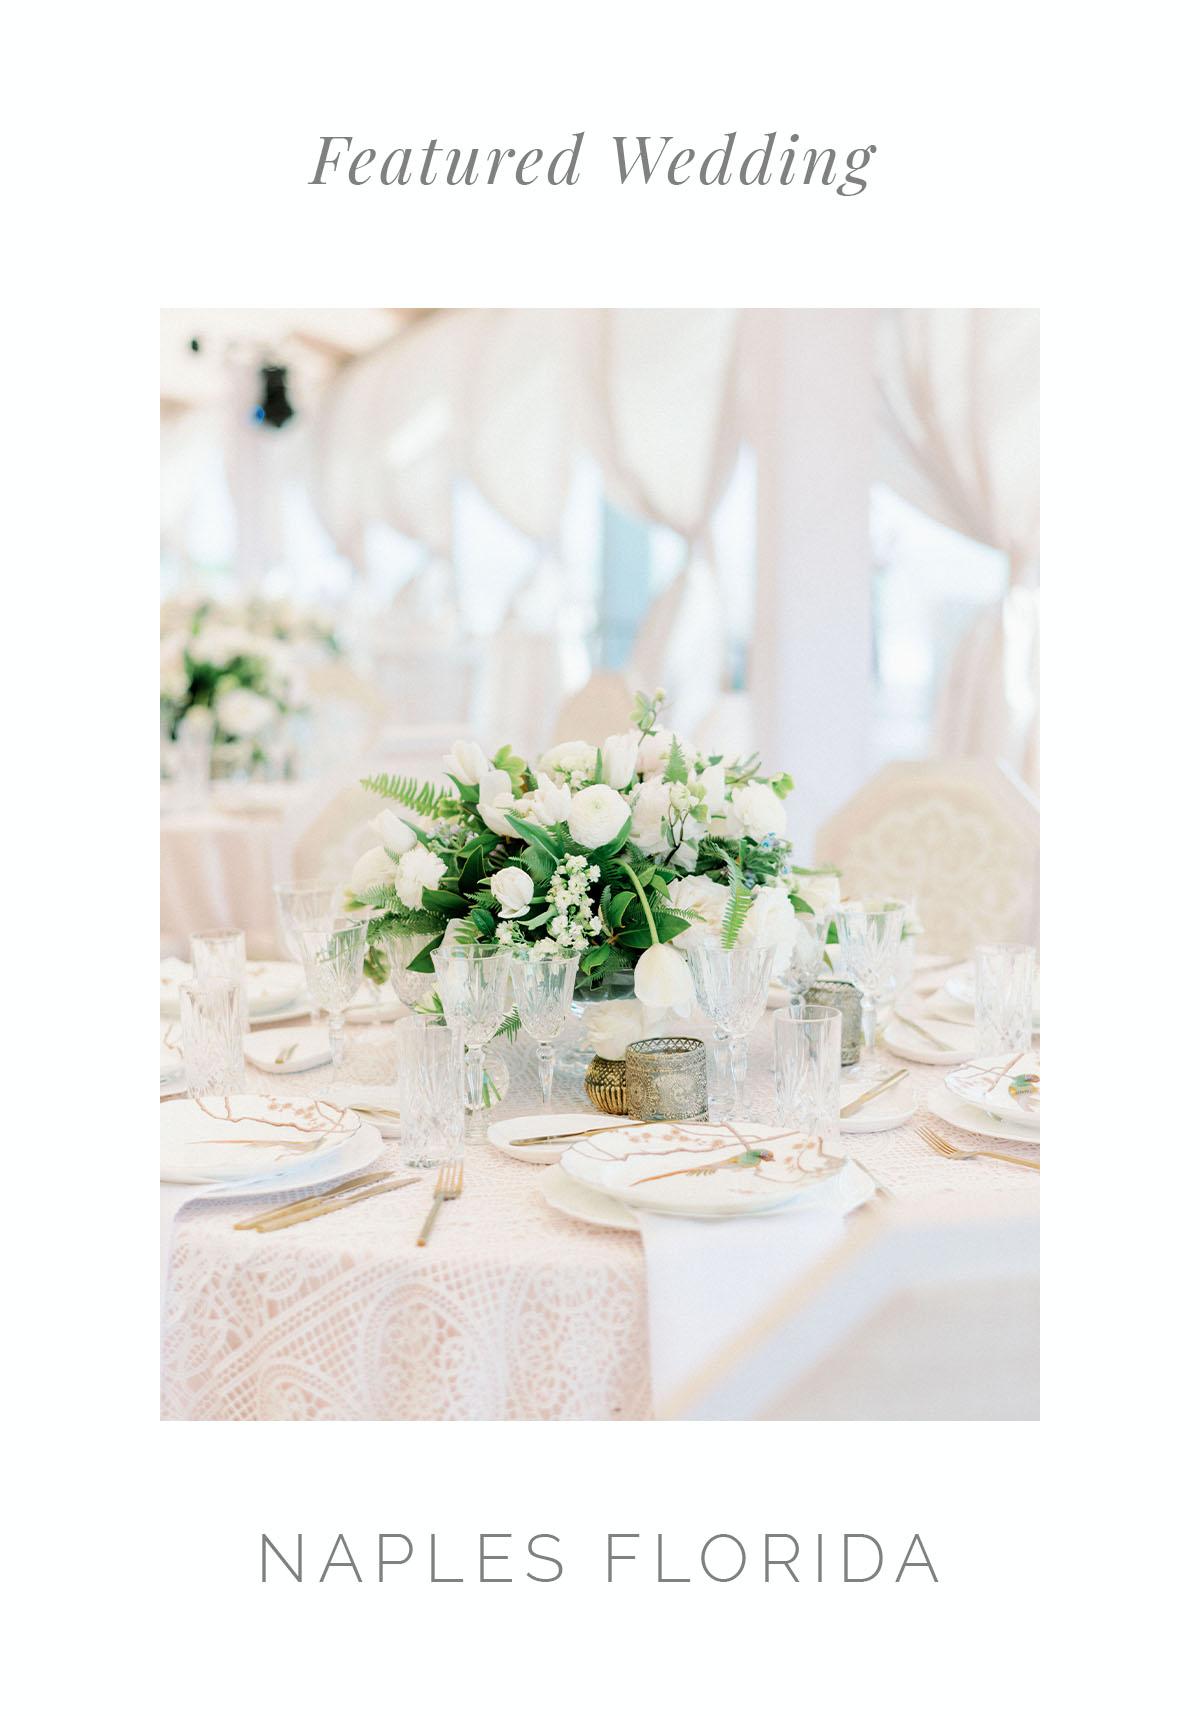 hunter ryan photo - featured wedding port royal club naples florida 2.jpg